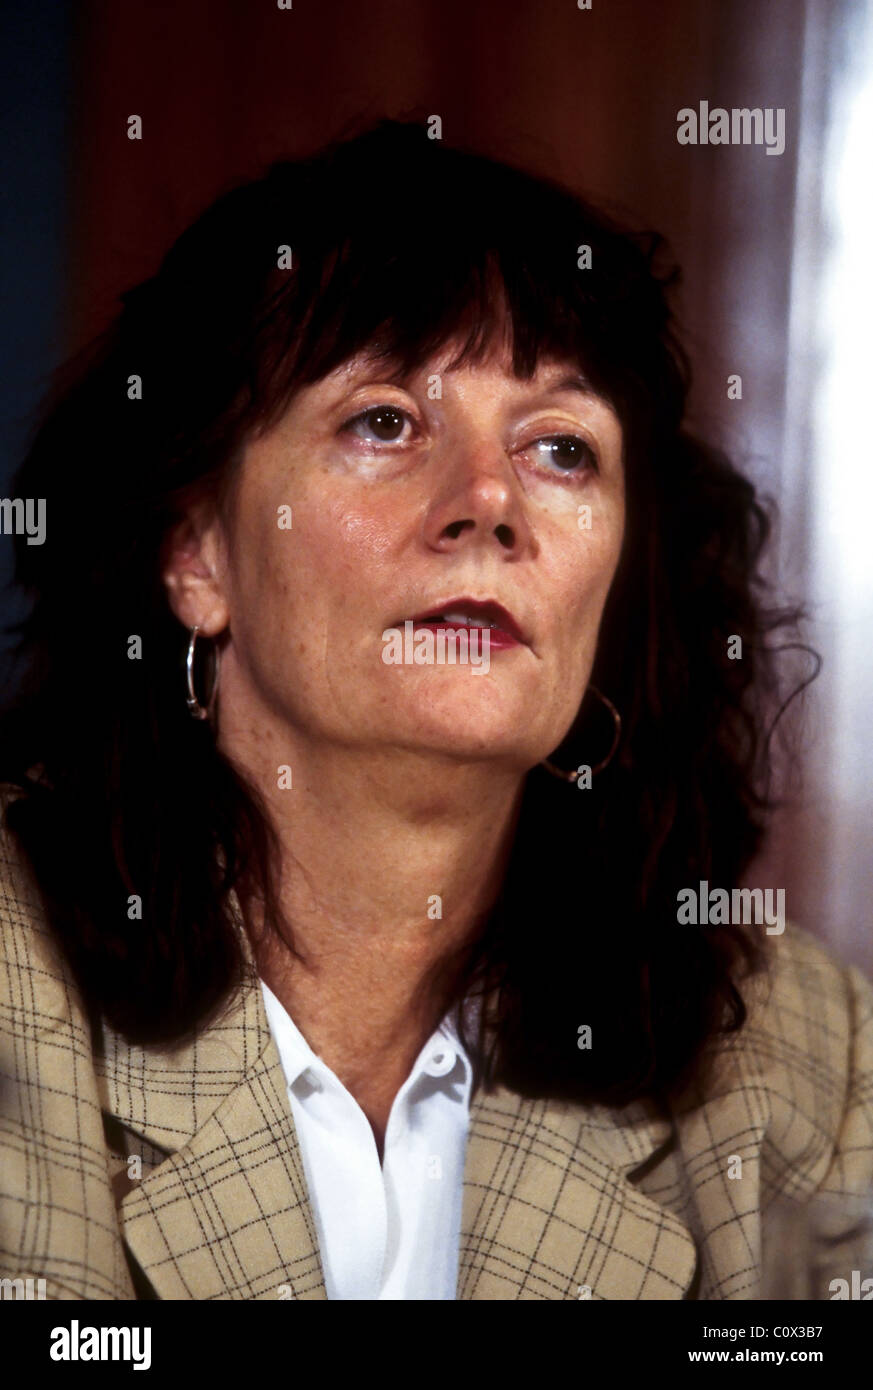 IRA Representative to the US Mairead Keane in Washington, DC. September 3, 1997 - Stock Image